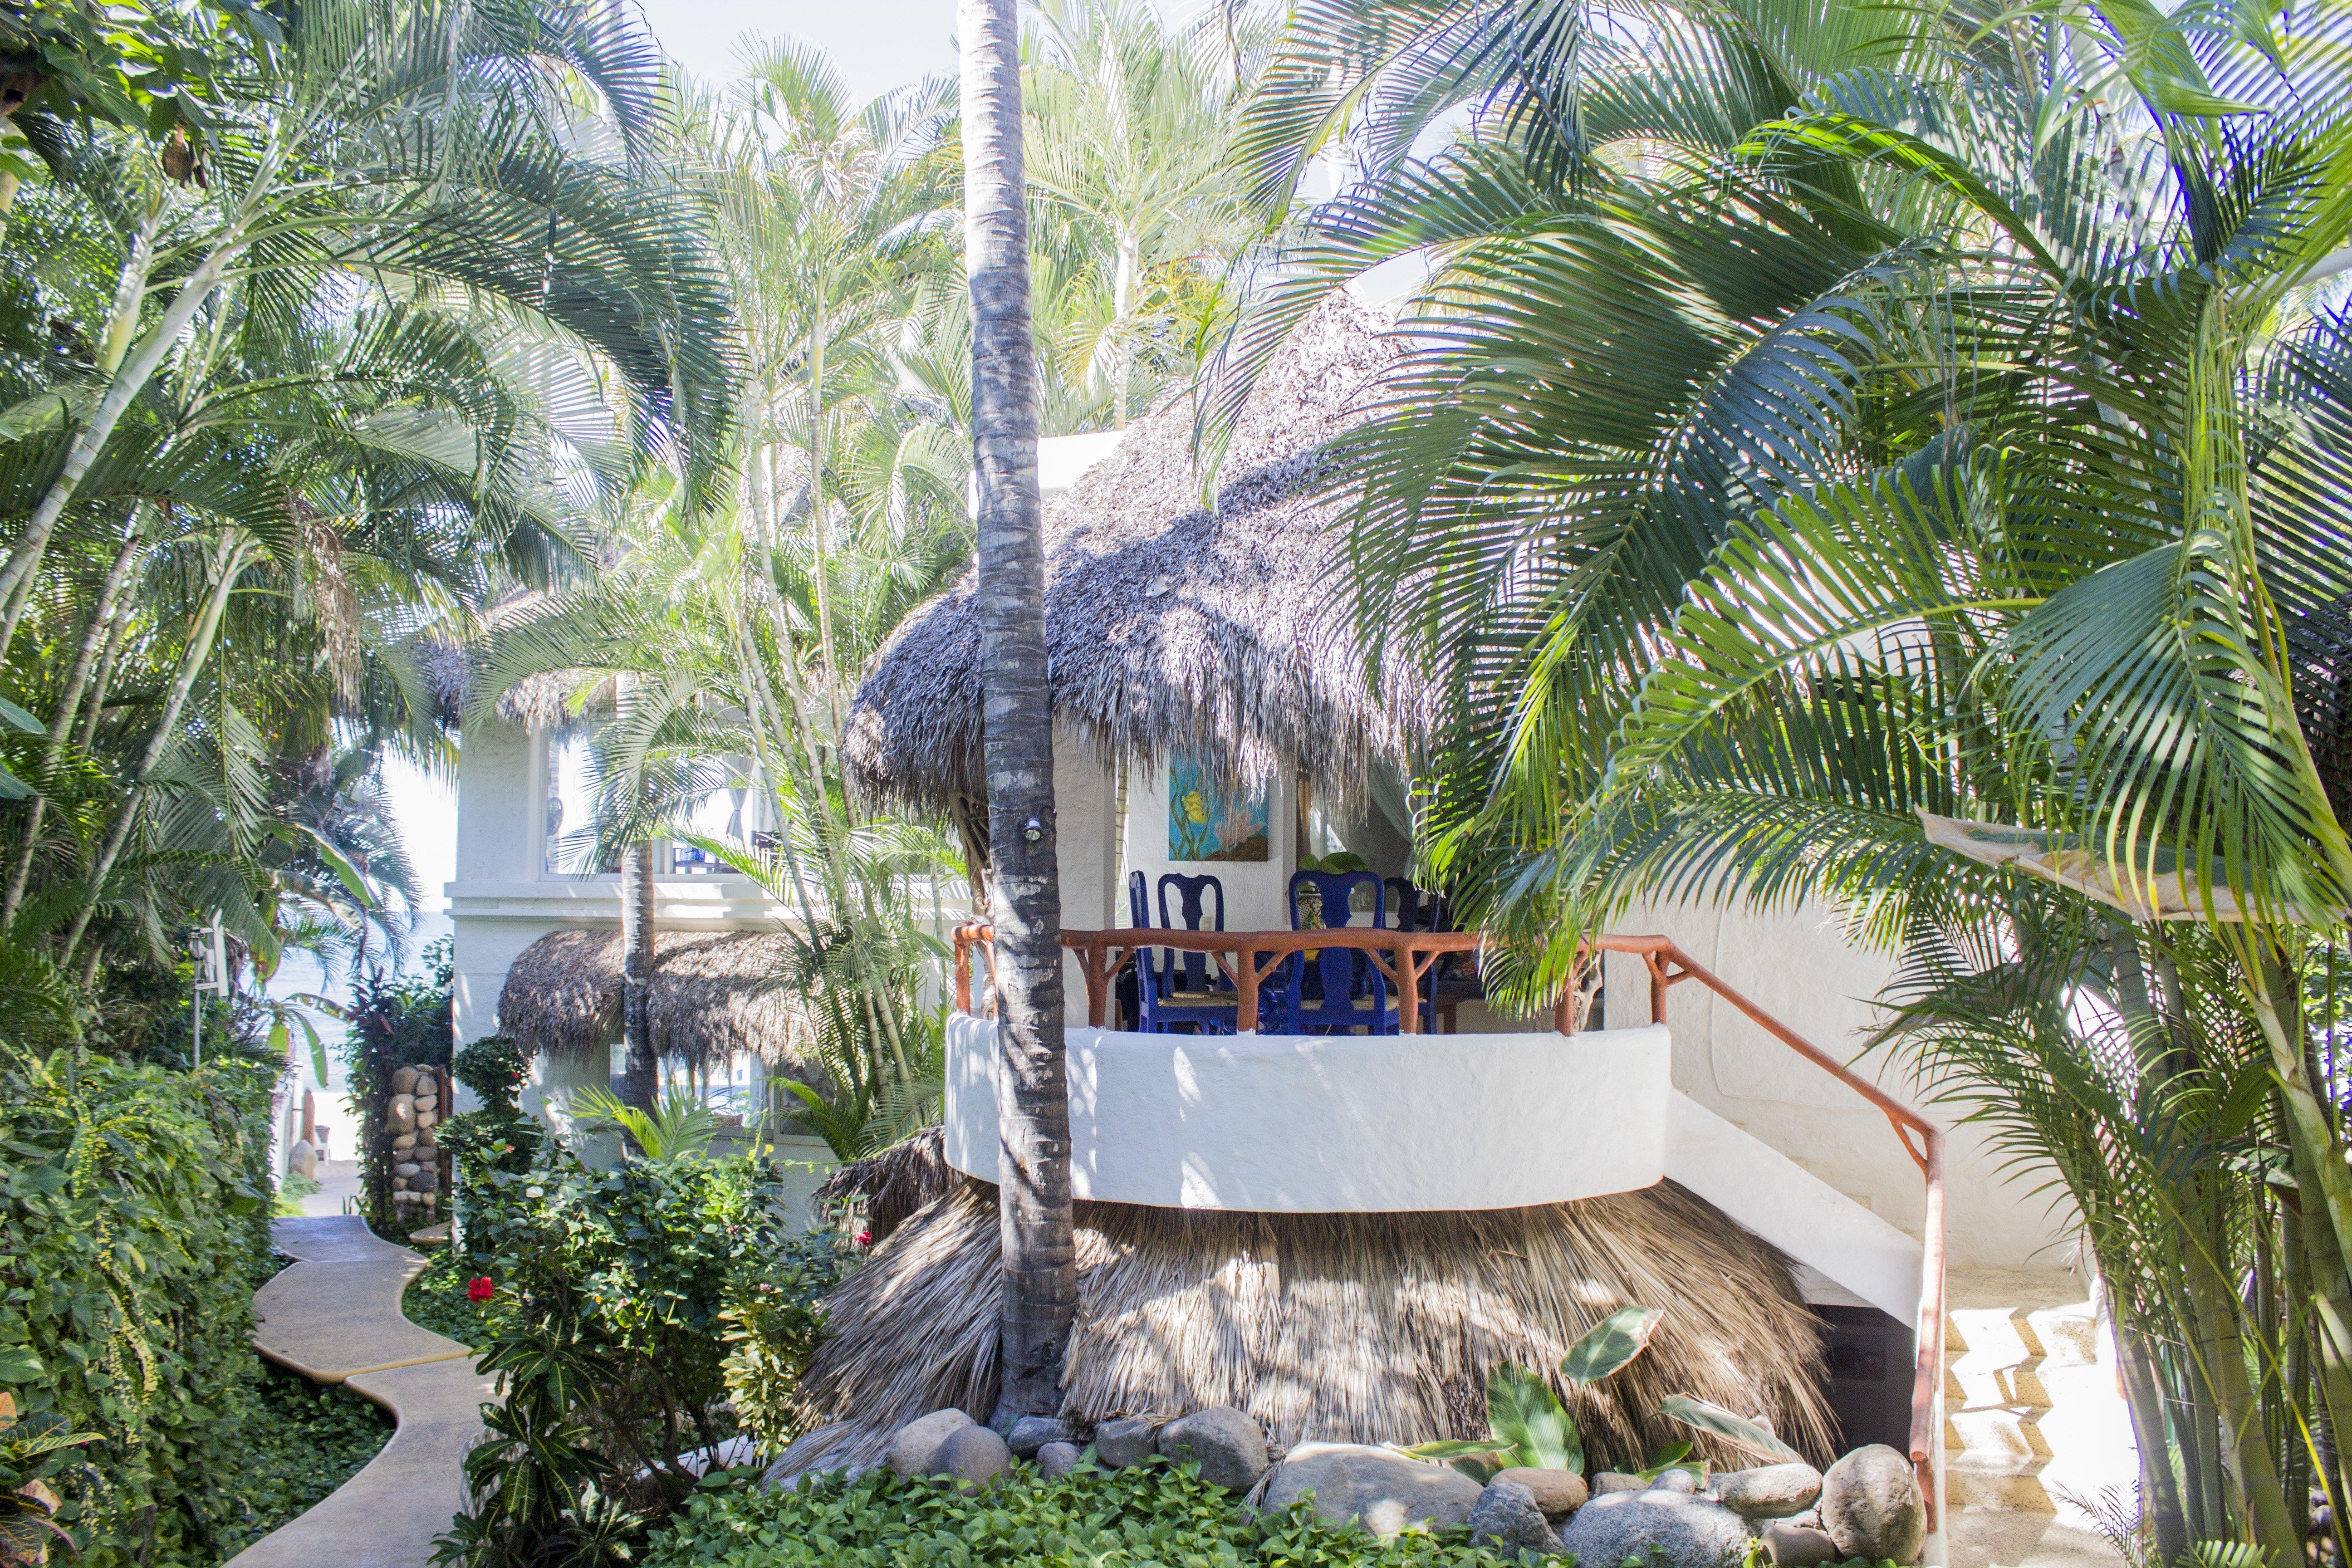 Beach Hotel Casablanca Sayulita